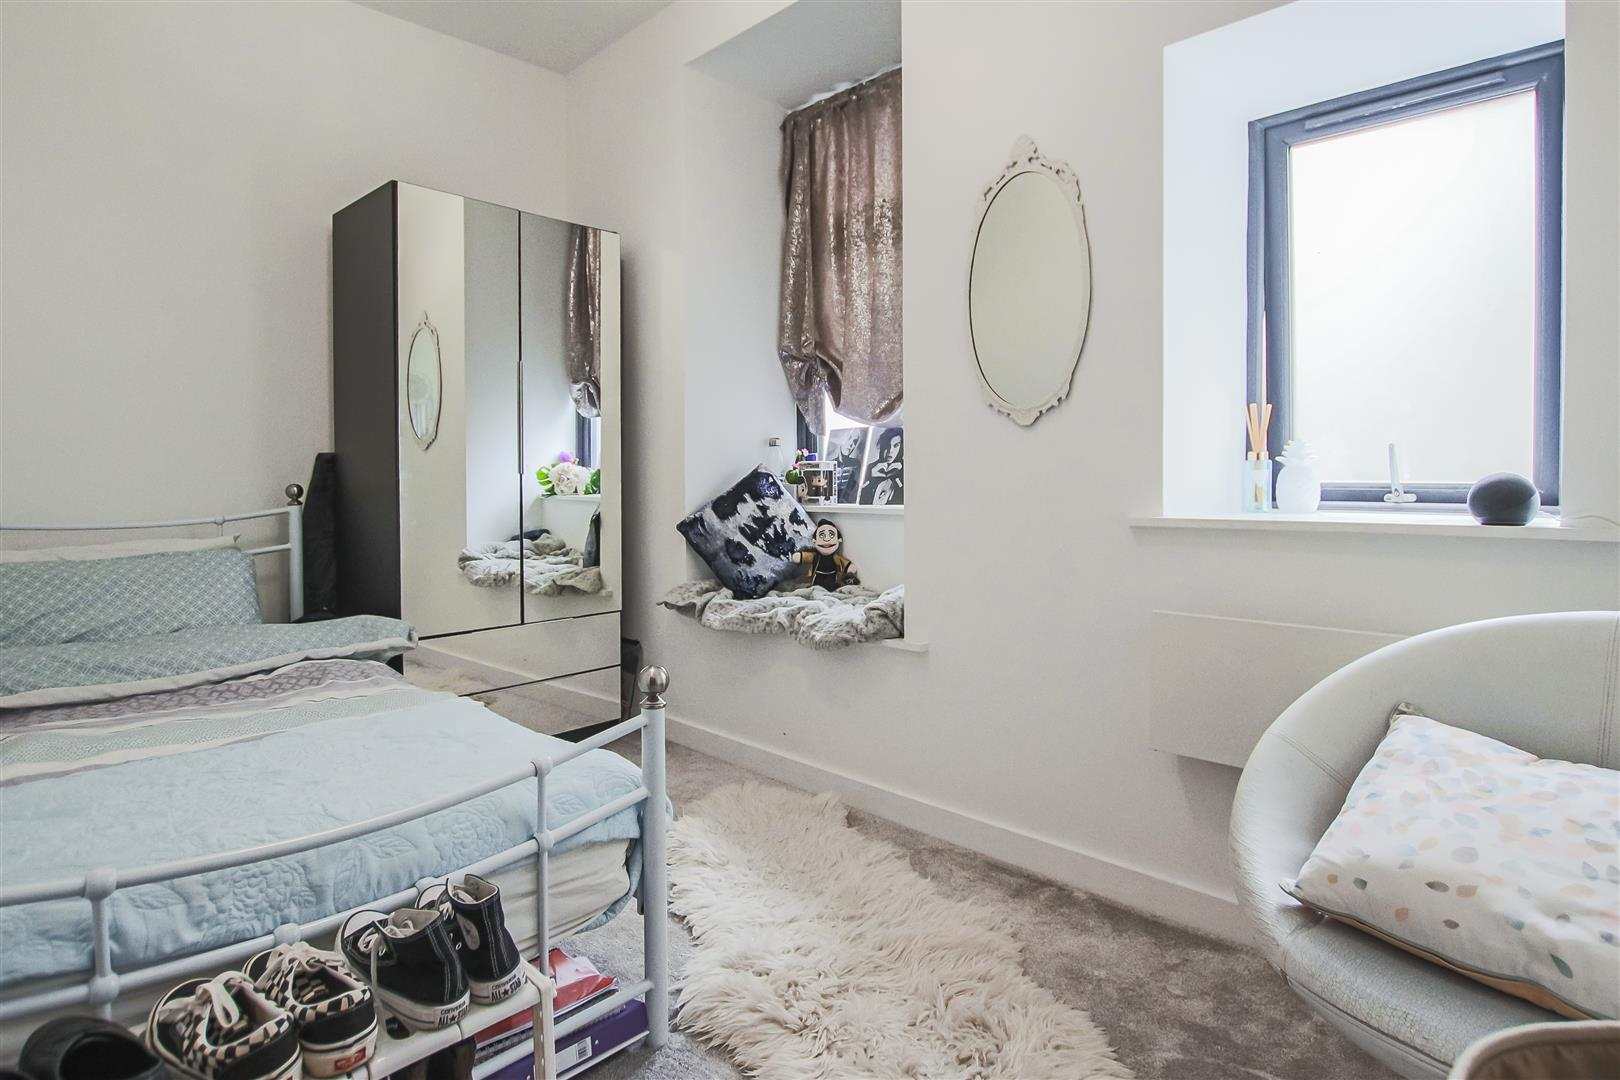 3 Bedroom Duplex Apartment For Sale - Image 7